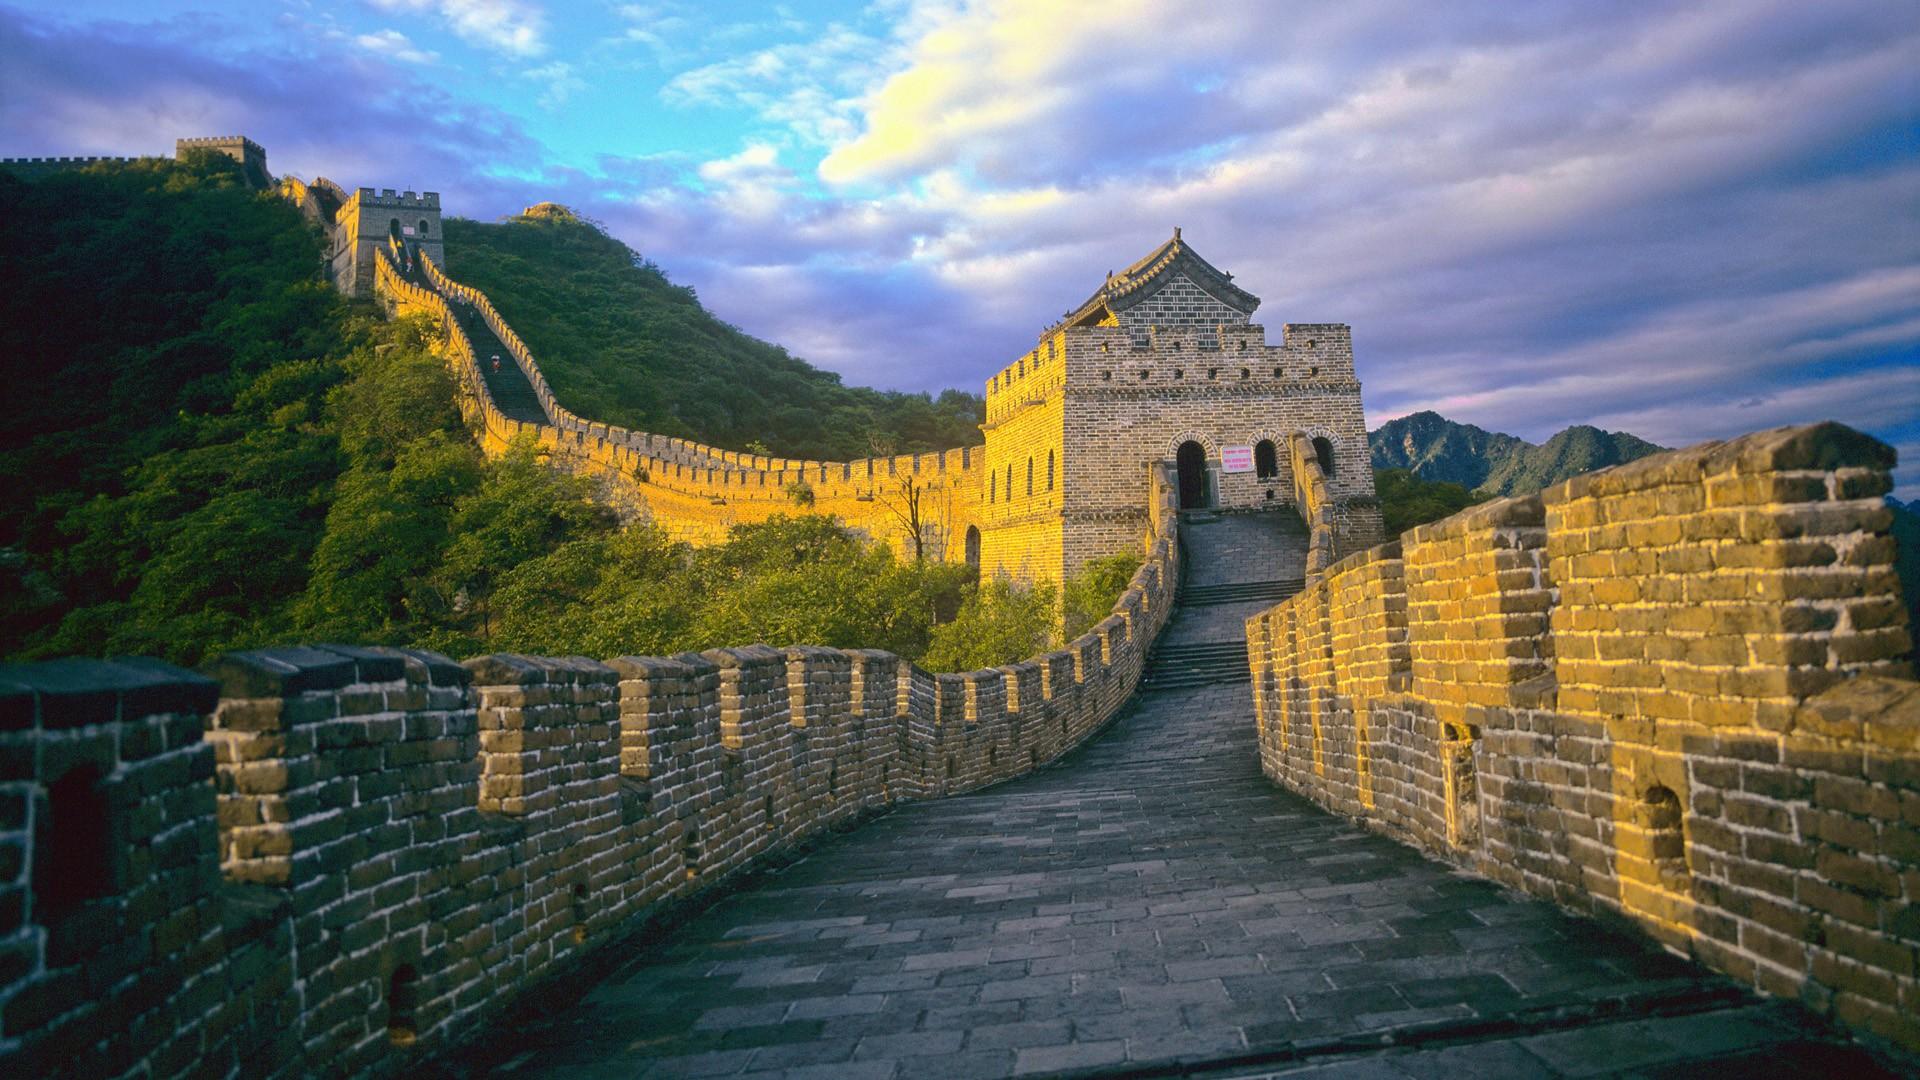 7 wonders of the world 2013 essay topics